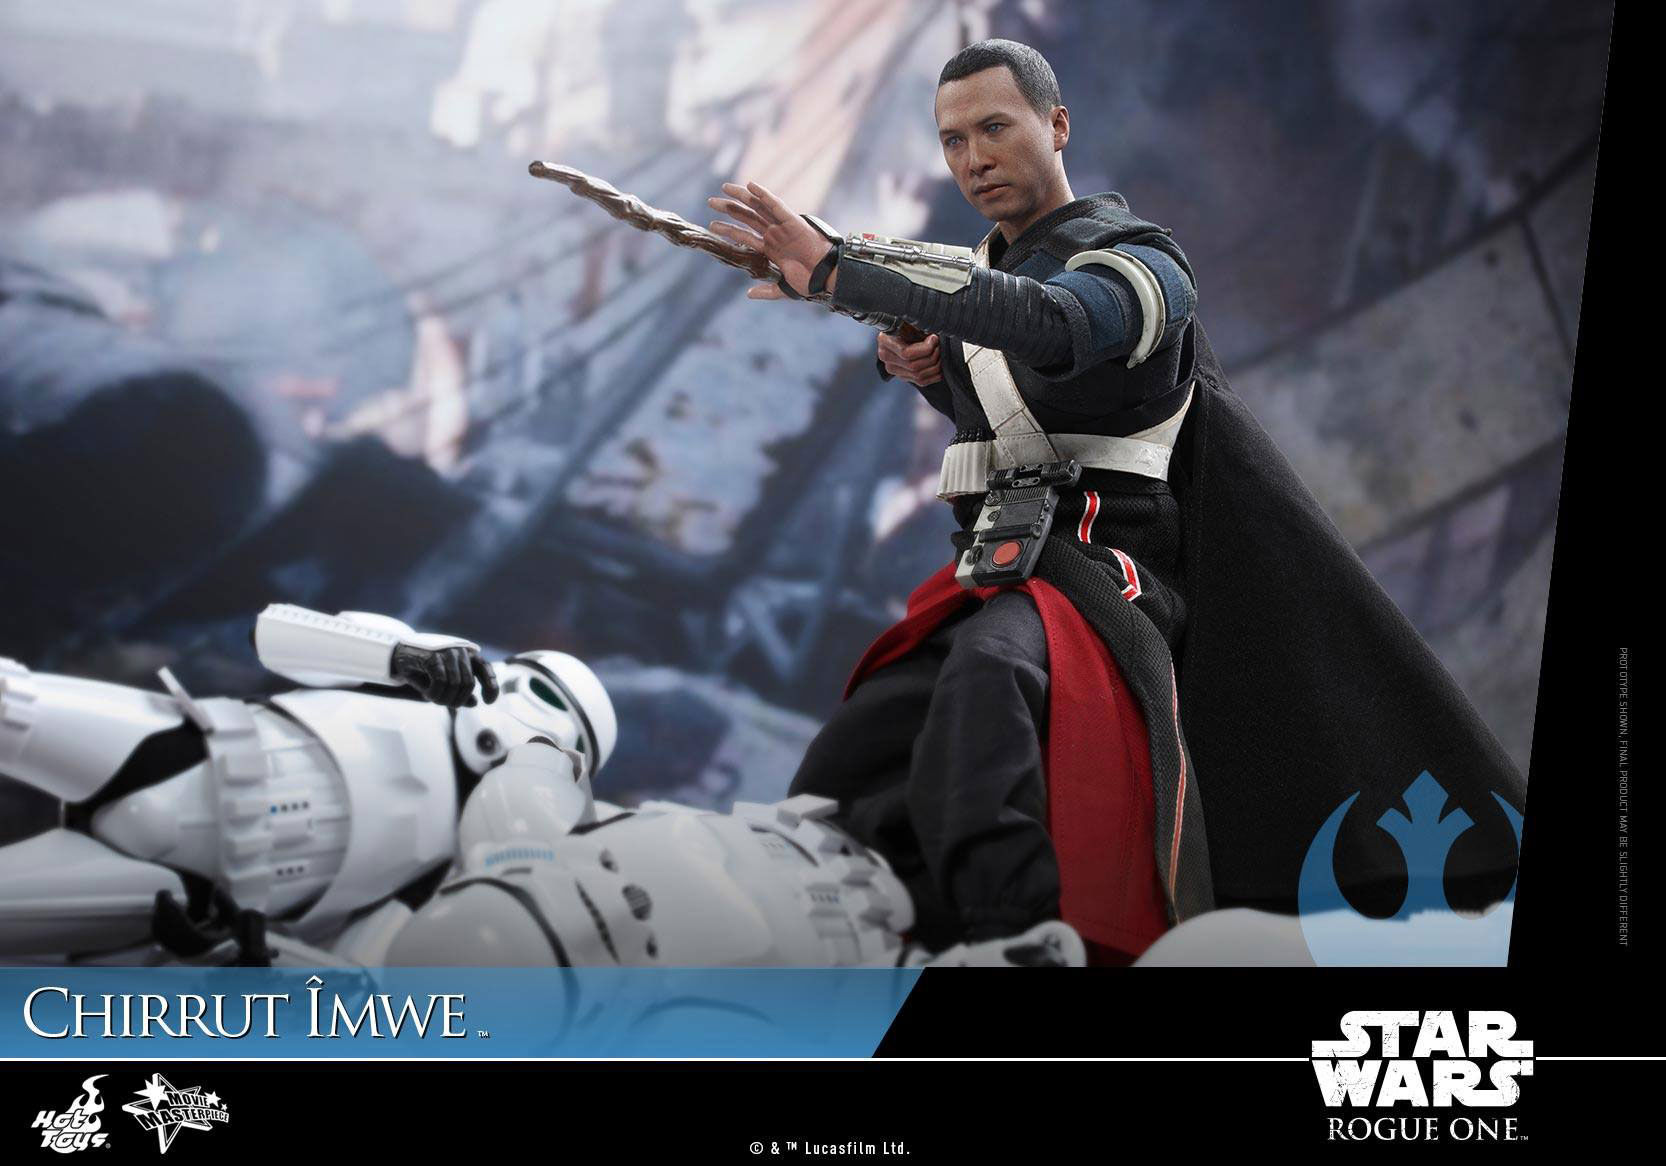 Hot-Toys-Star-Wars-Rogue-One-Chirrut-Imwe-figure-1